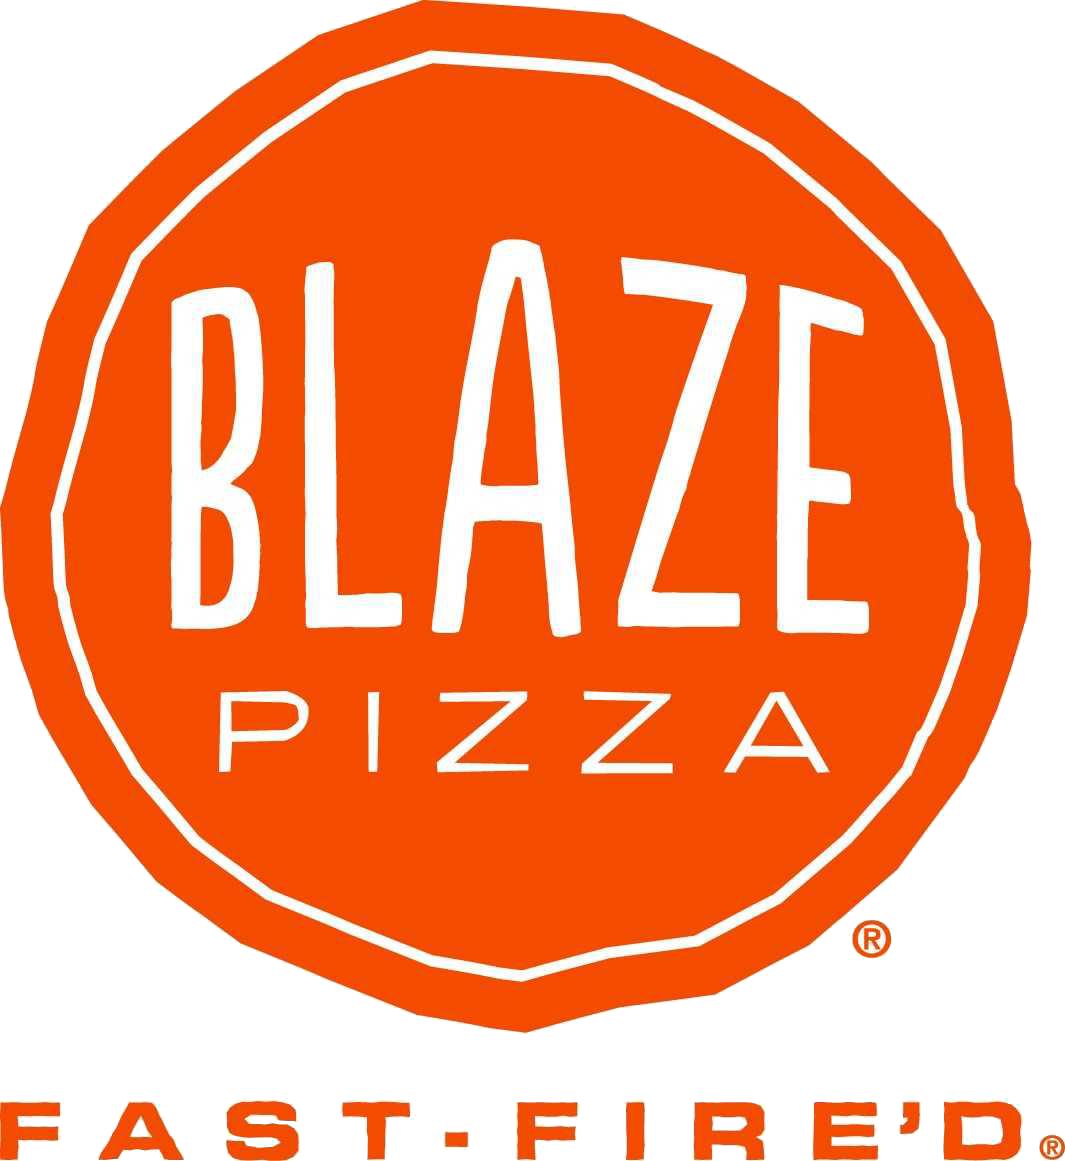 Blaze Pizza Logo.png